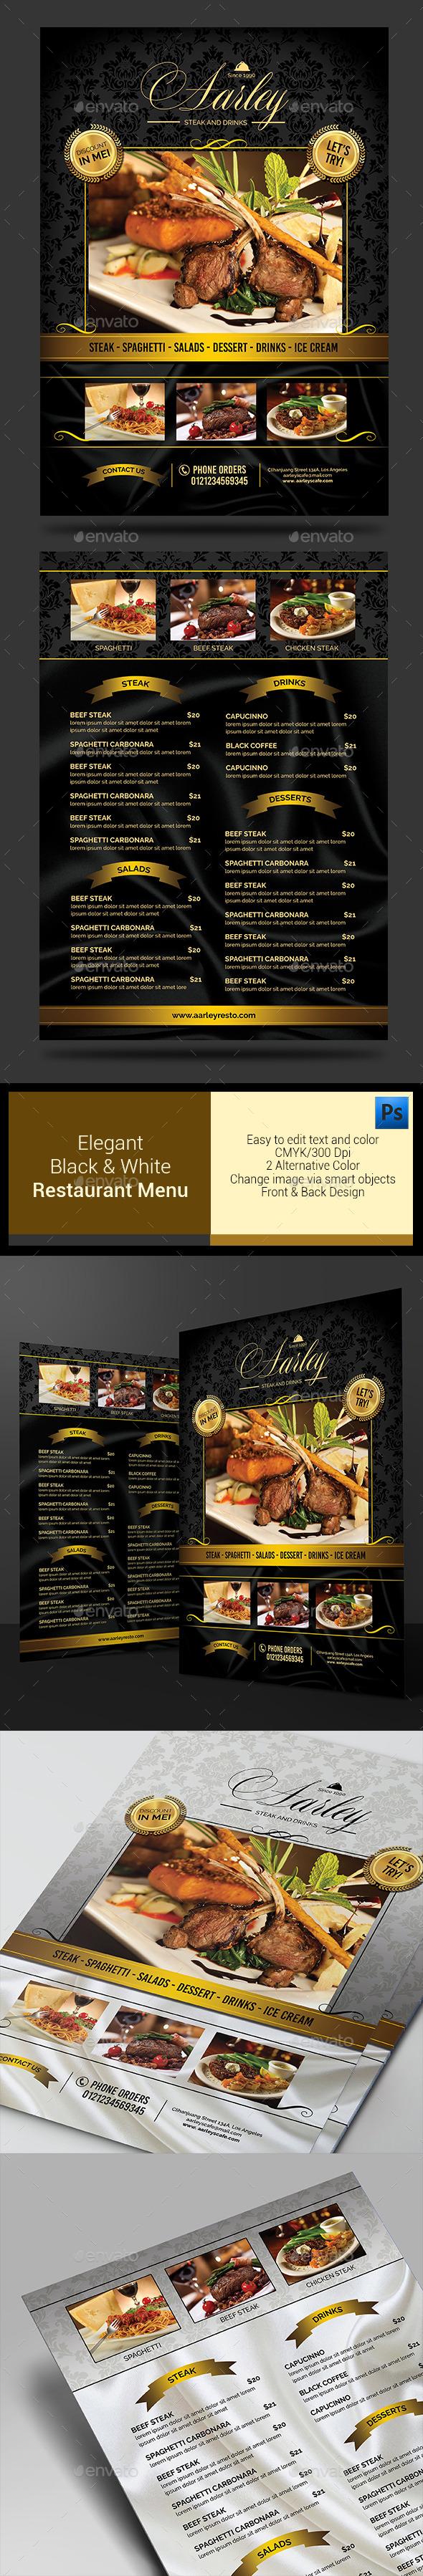 Elegant Black & White Restaurant Menu